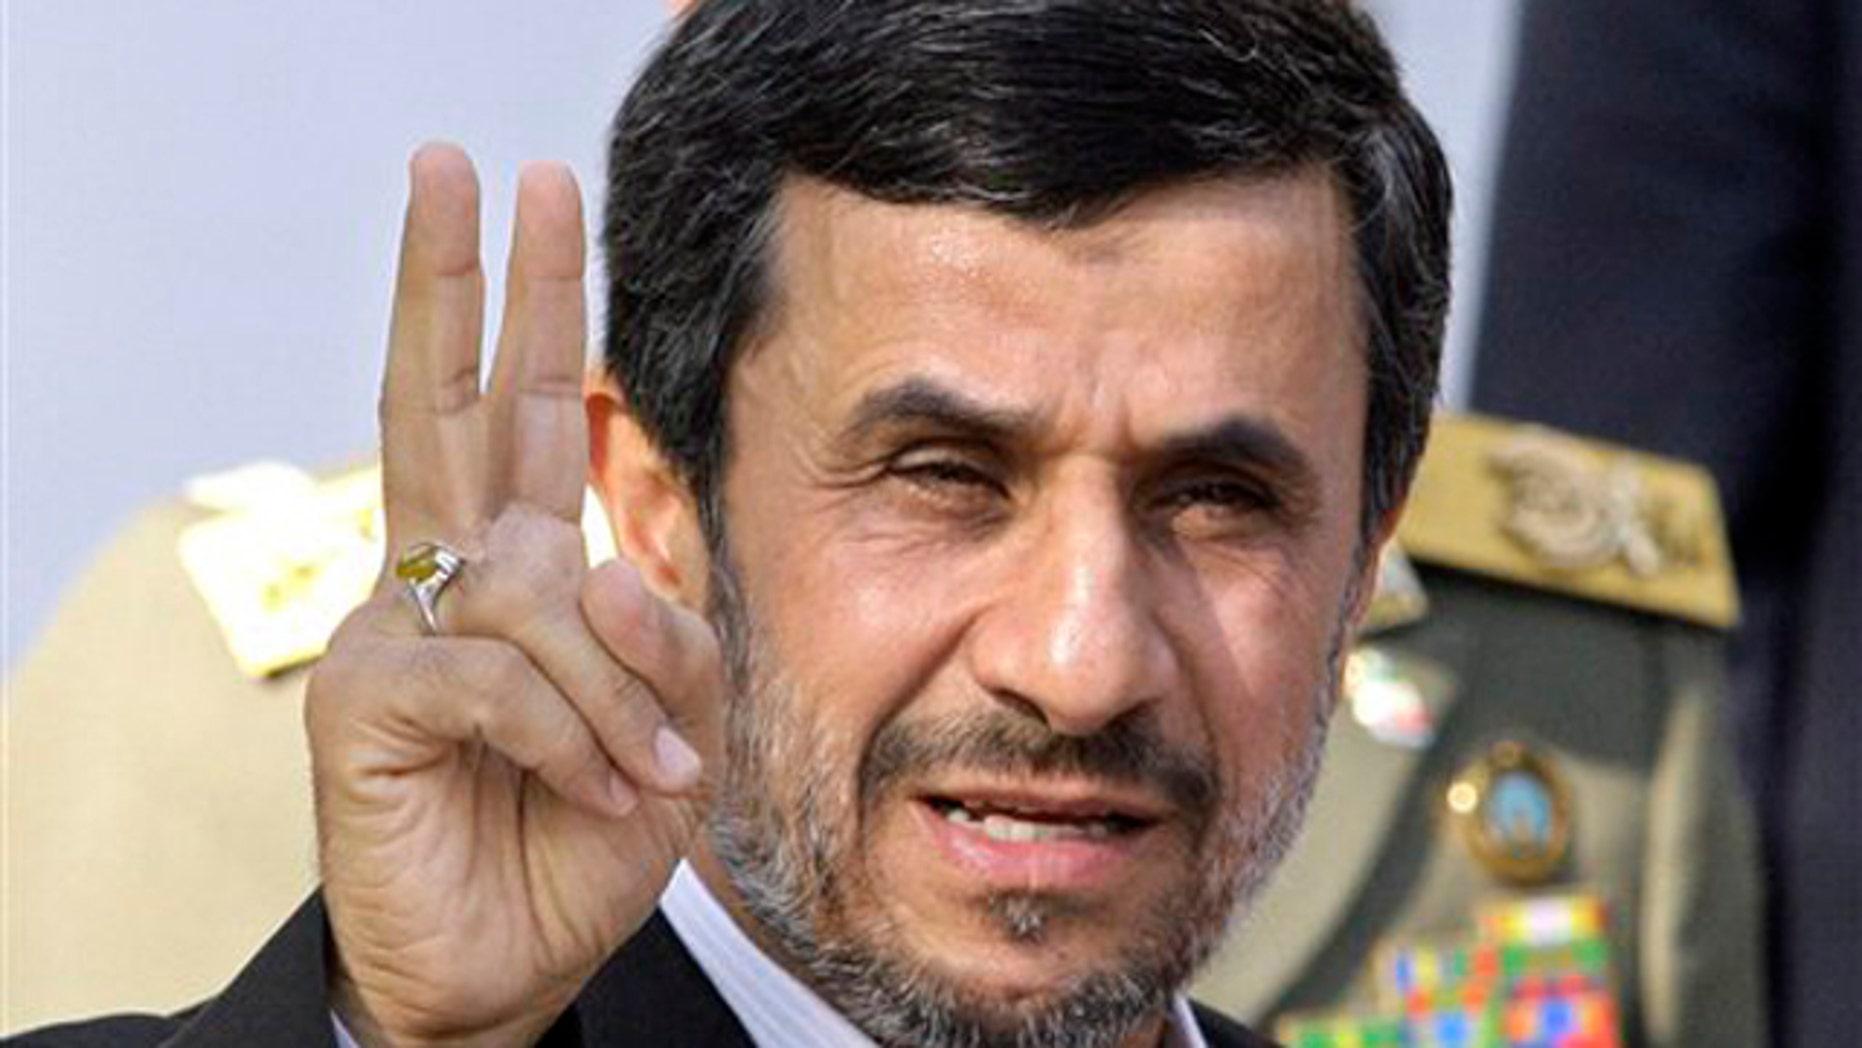 Iranian President Mahmoud Ahmadinejad's regime is ramping up its cyber warfare capabilities. (AP)